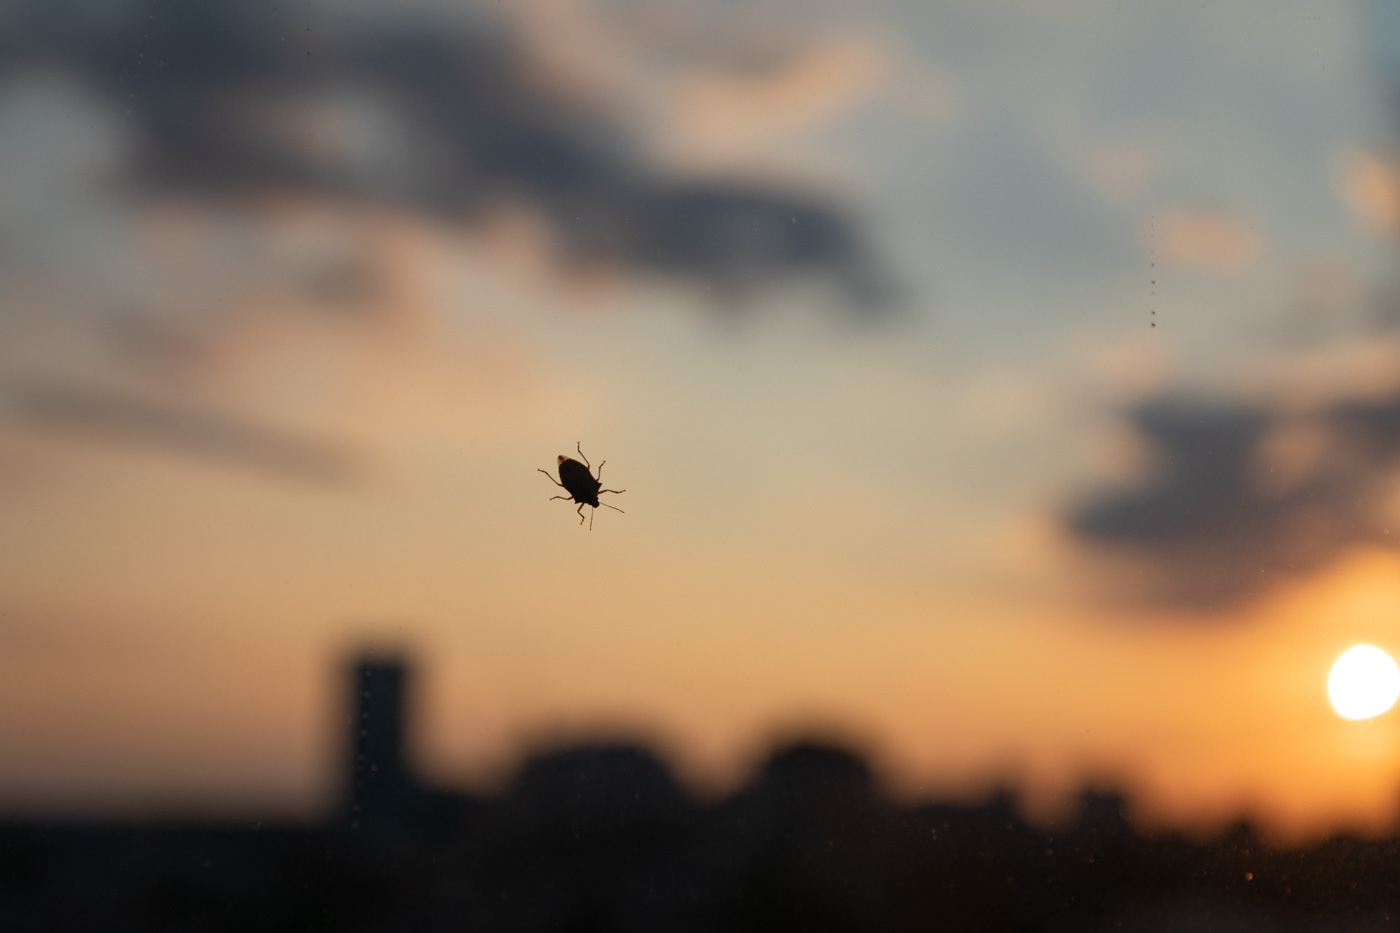 Bug on a Window